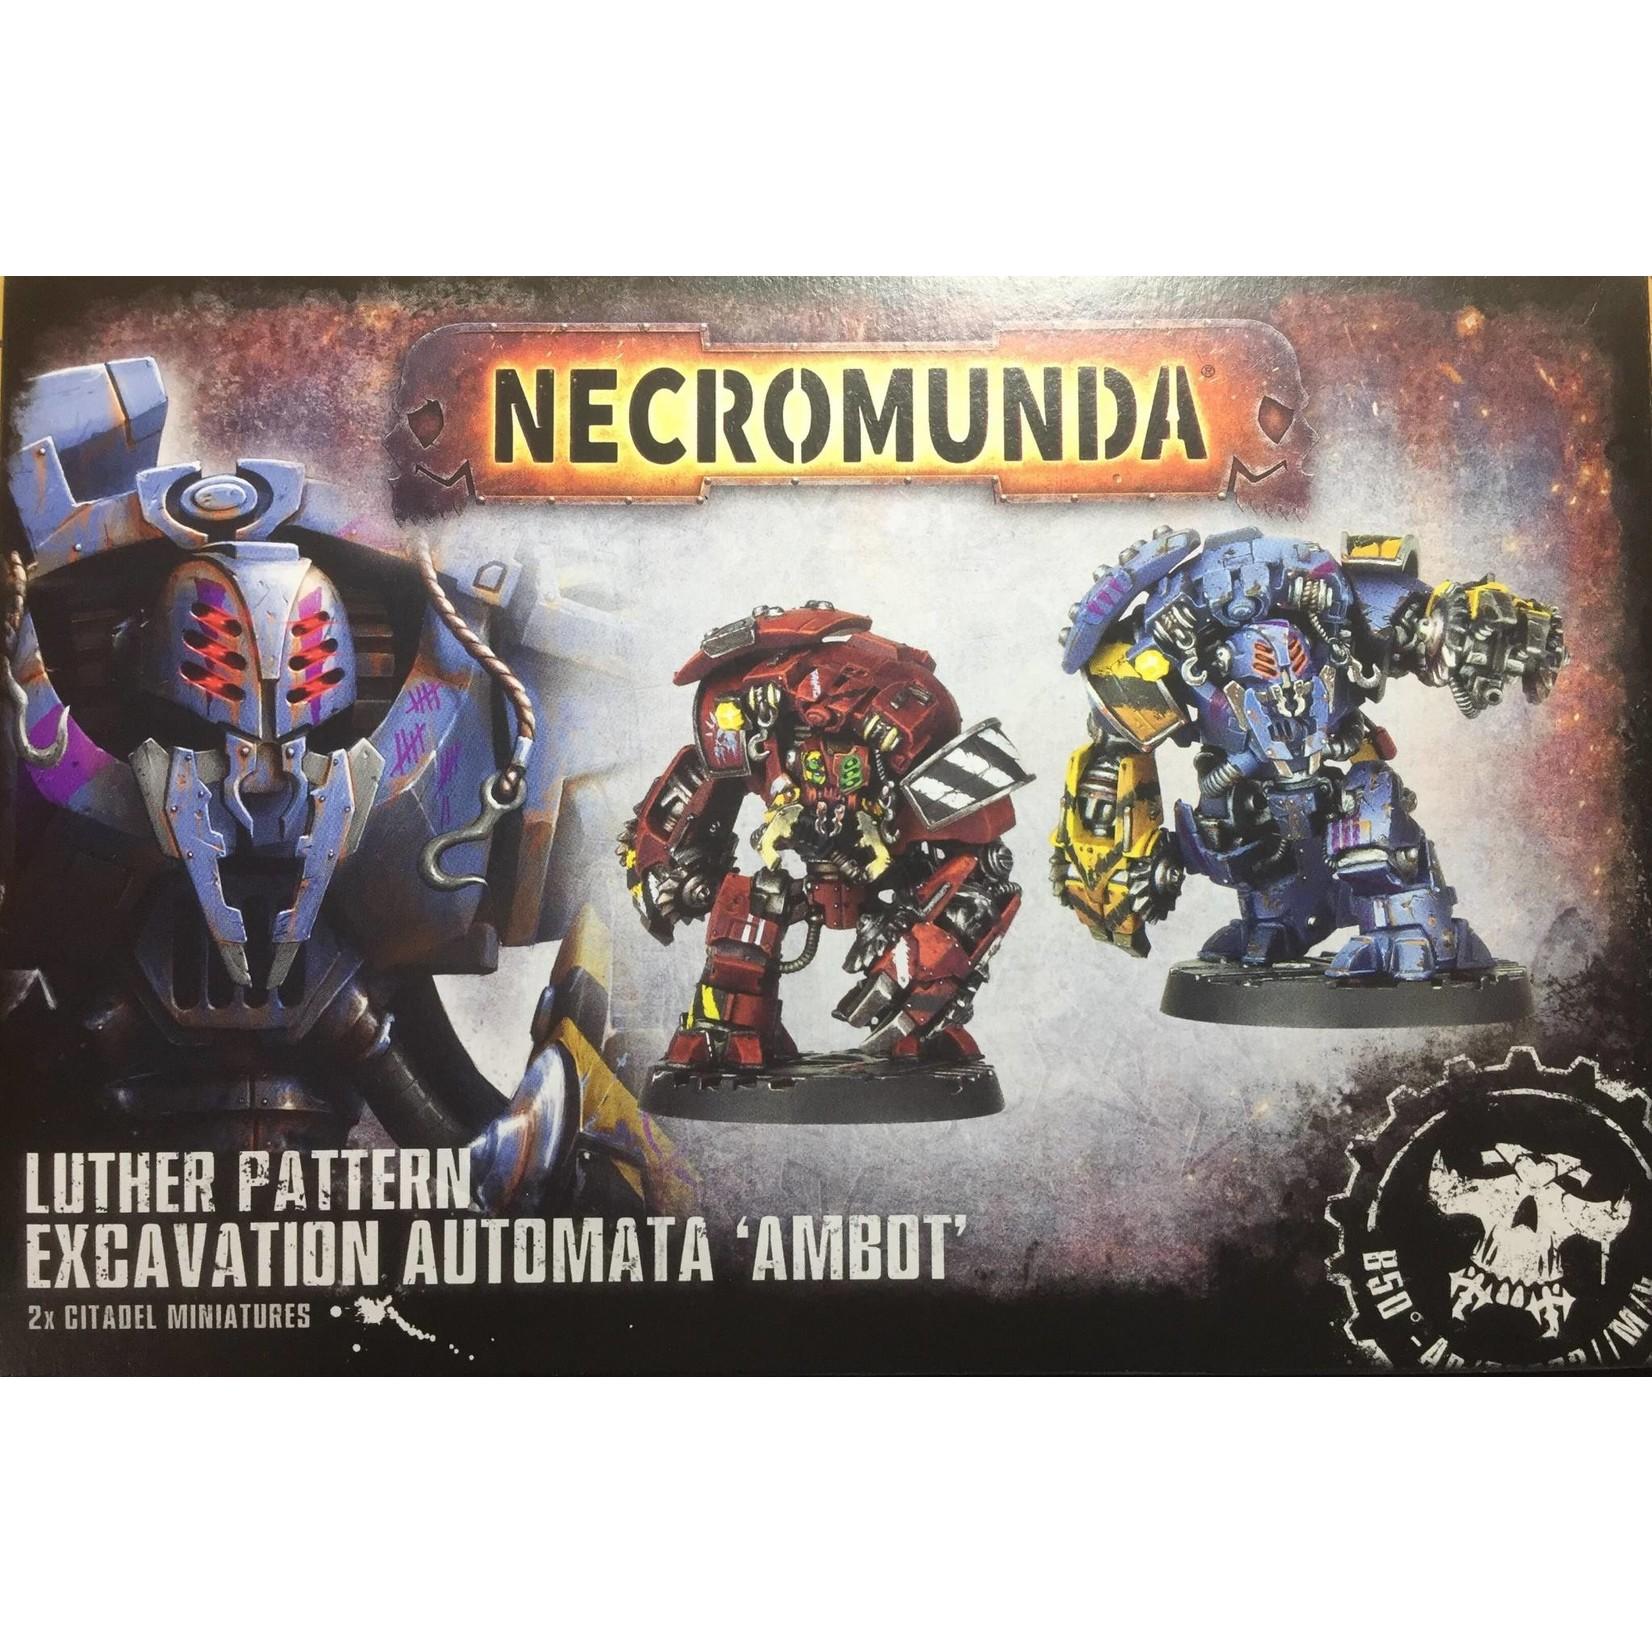 Necromunda Excavation Automata Ambot